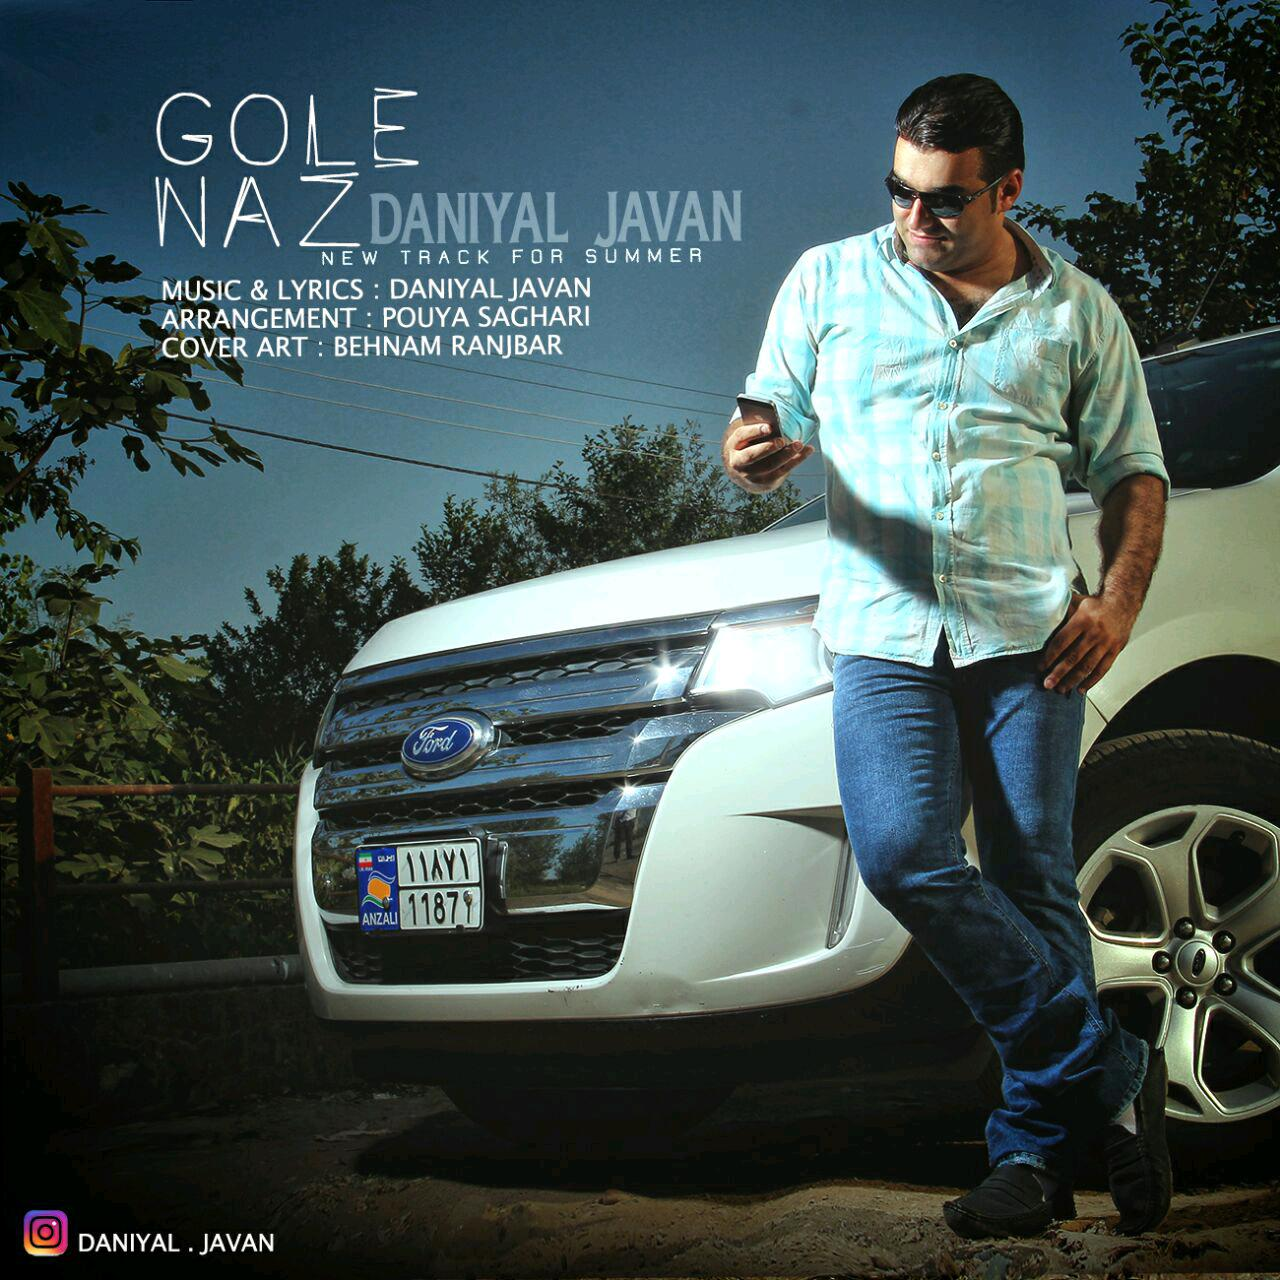 Daniyal Javan – Gole Naz